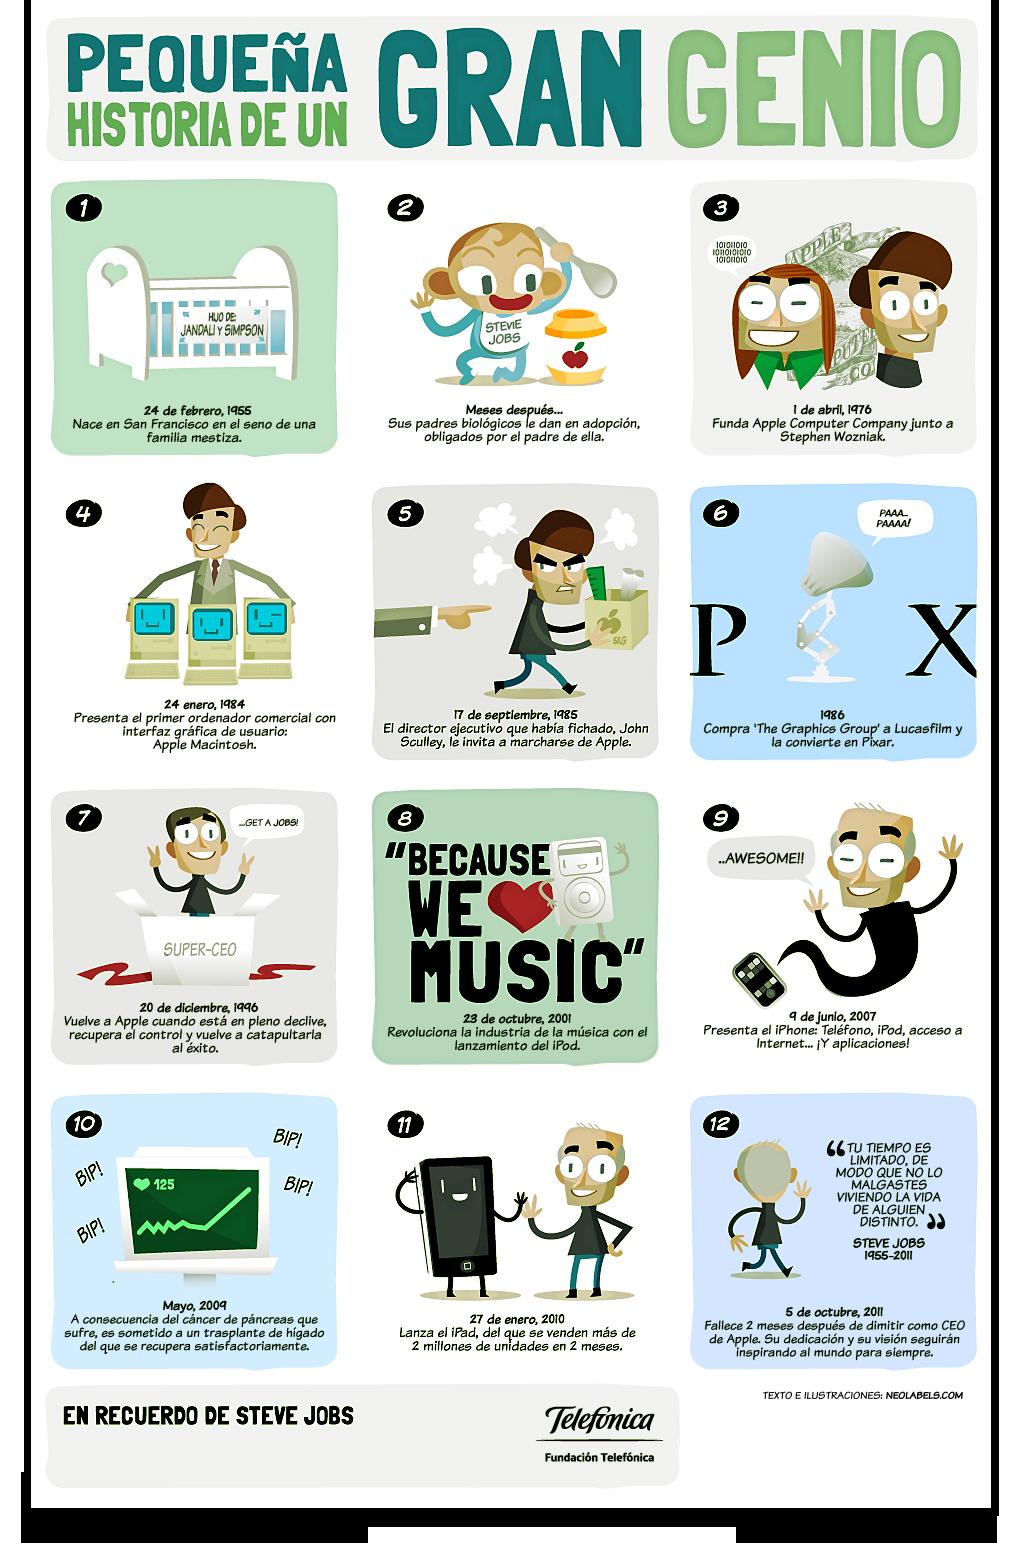 La vida de Steve Jobs en Infografía 2